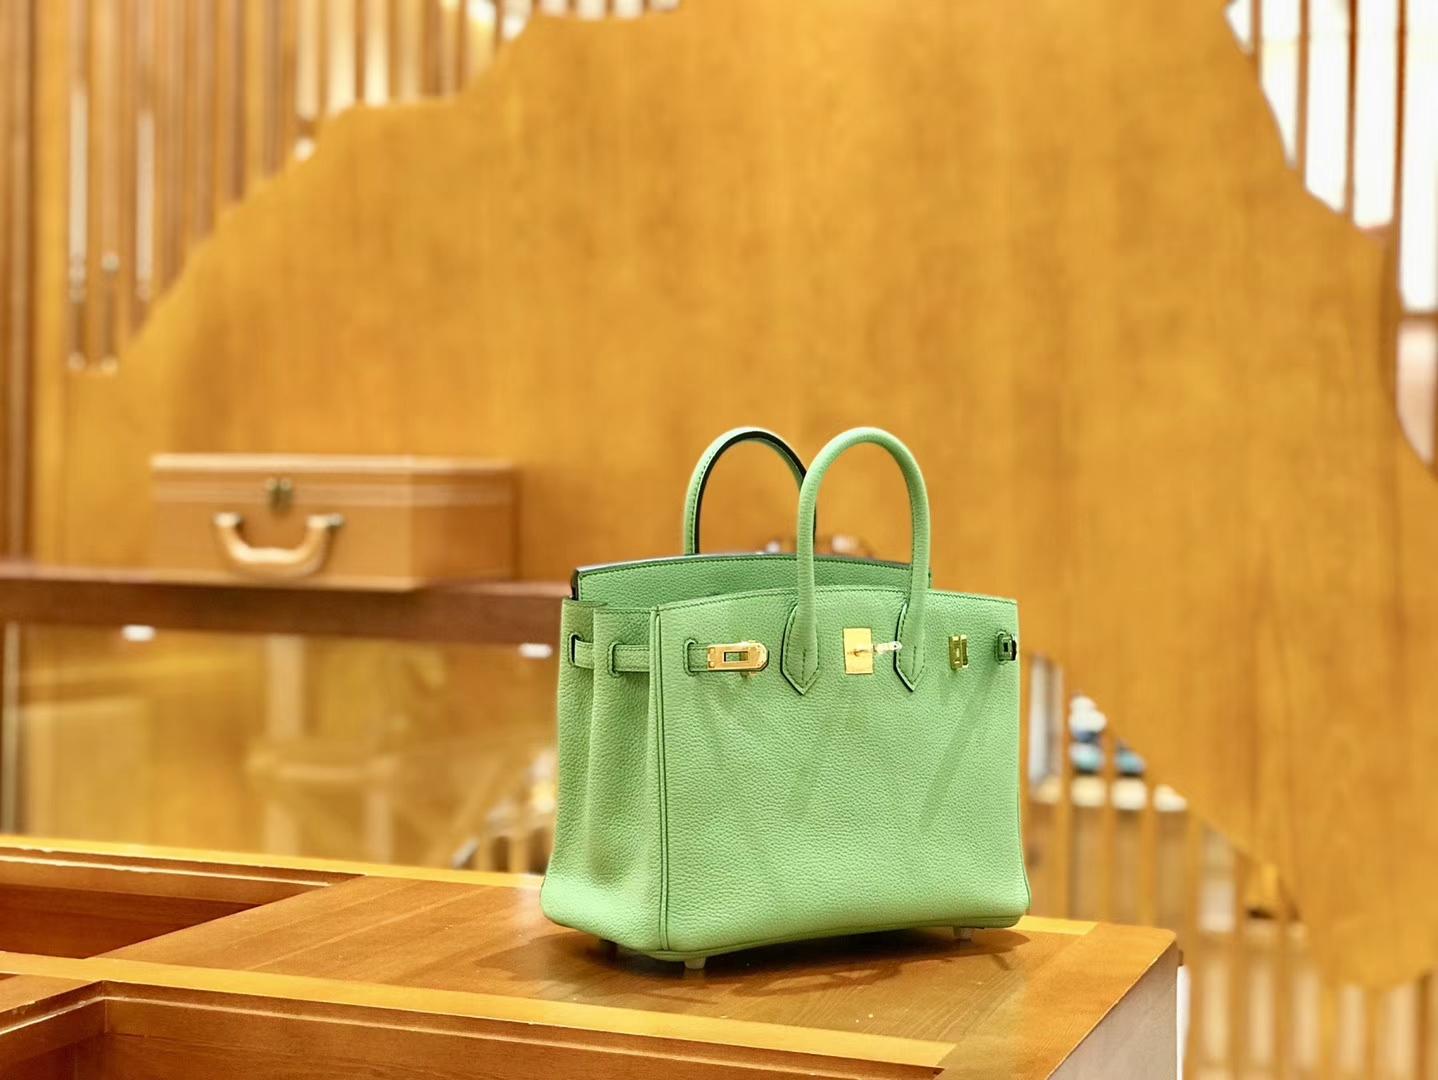 Hermès(爱马仕)Birkin 25cm 牛油果 金扣 全手工缝制